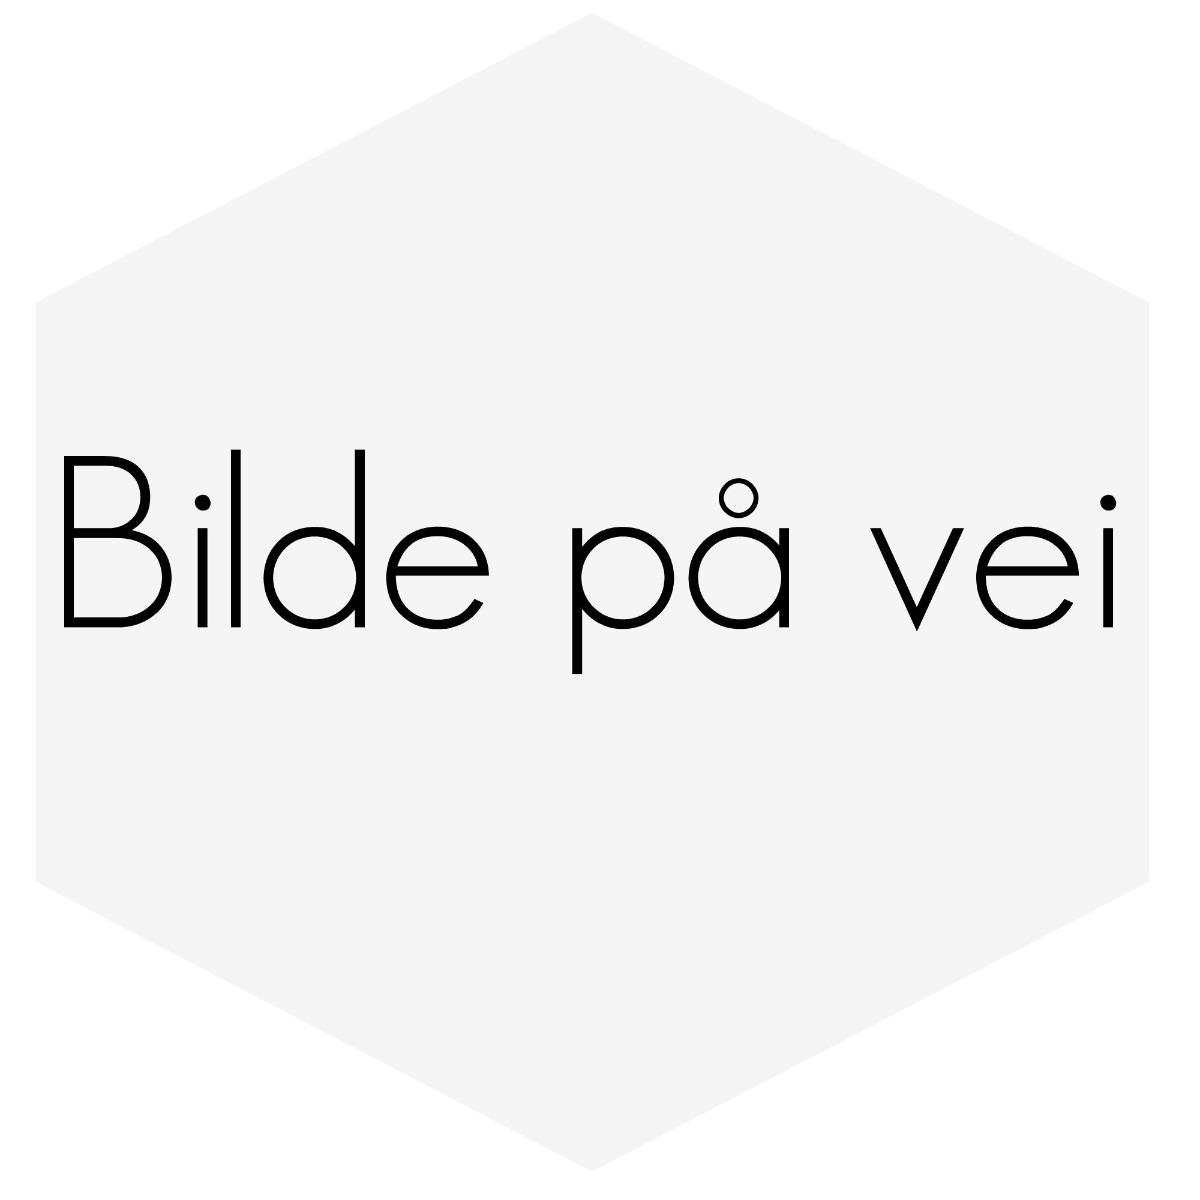 VOLVO C30/C70/S40/V50 TURBO AUTOMAT 04-13 KJØLESLANGER RØD